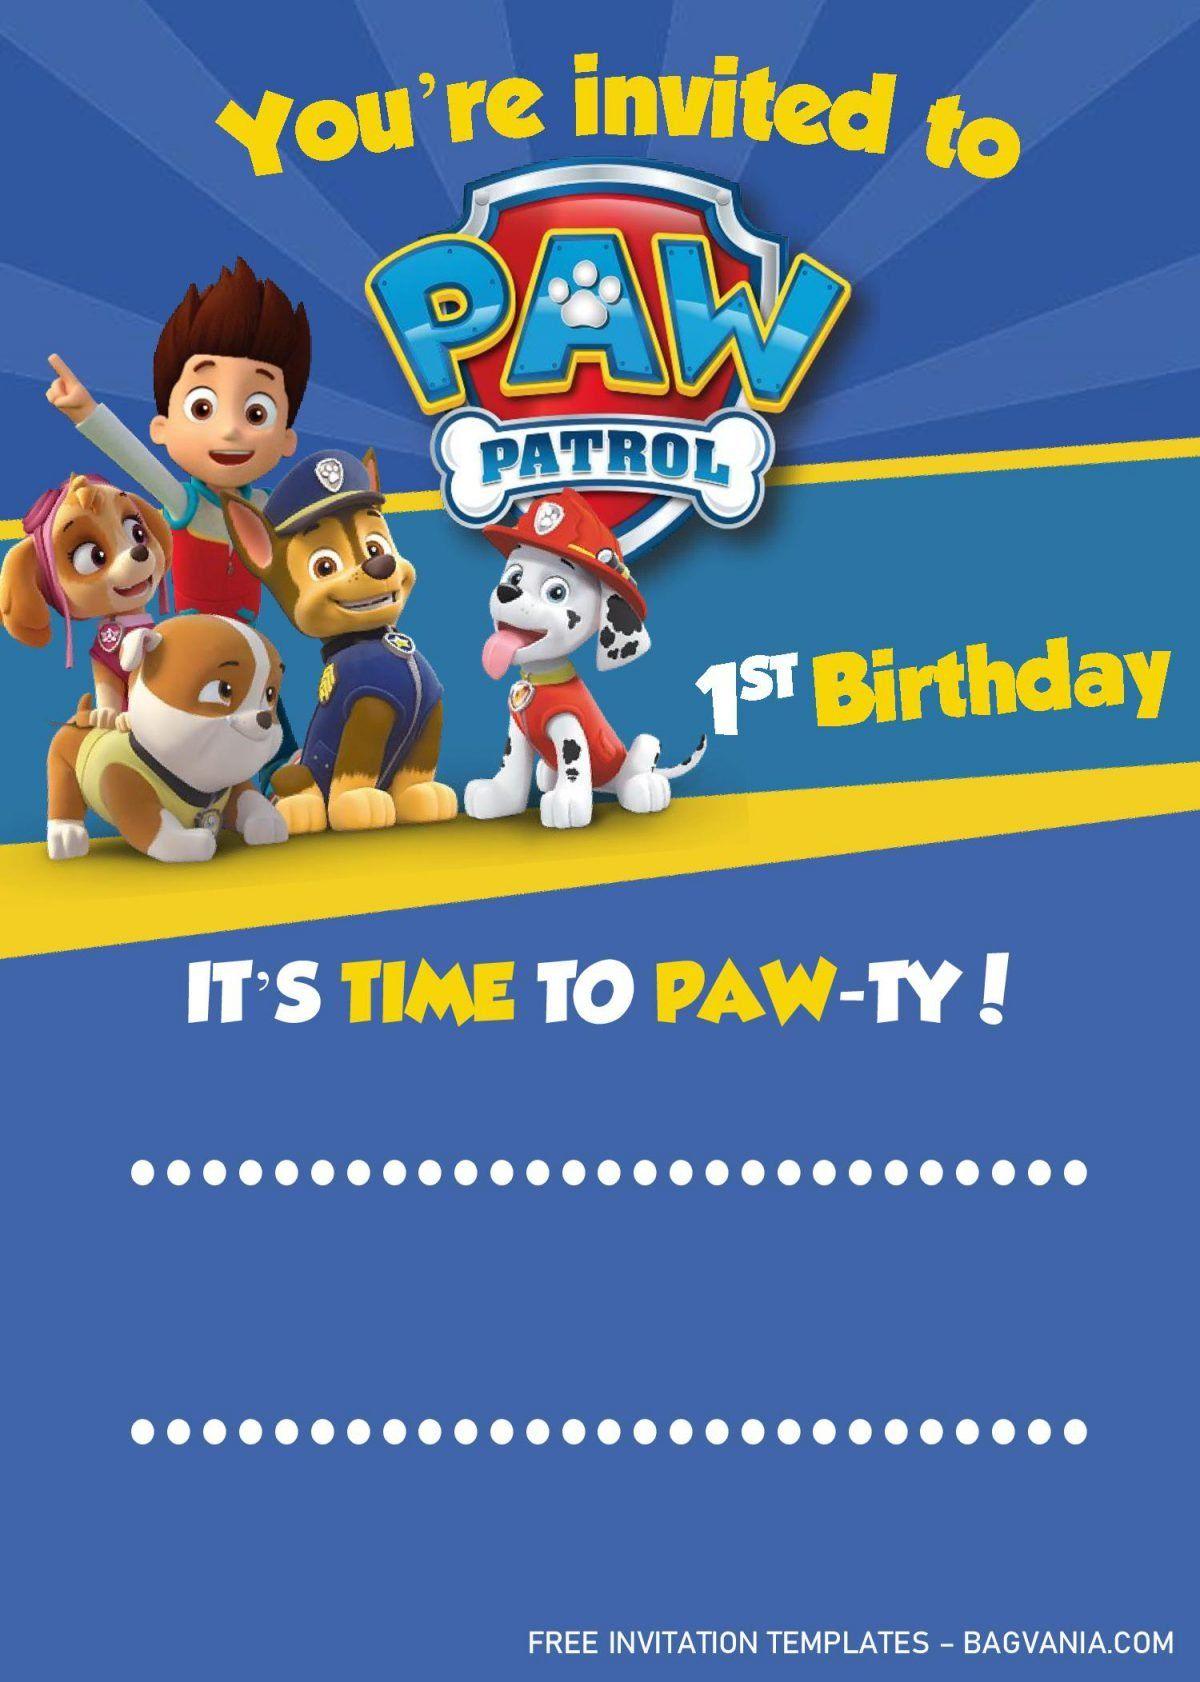 Paw Patrol Invitation Templates Editable With Ms Word Free Printable Birthday In Paw Patrol Invitations Paw Patrol Birthday Invitations Paw Patrol Birthday [ 1682 x 1200 Pixel ]